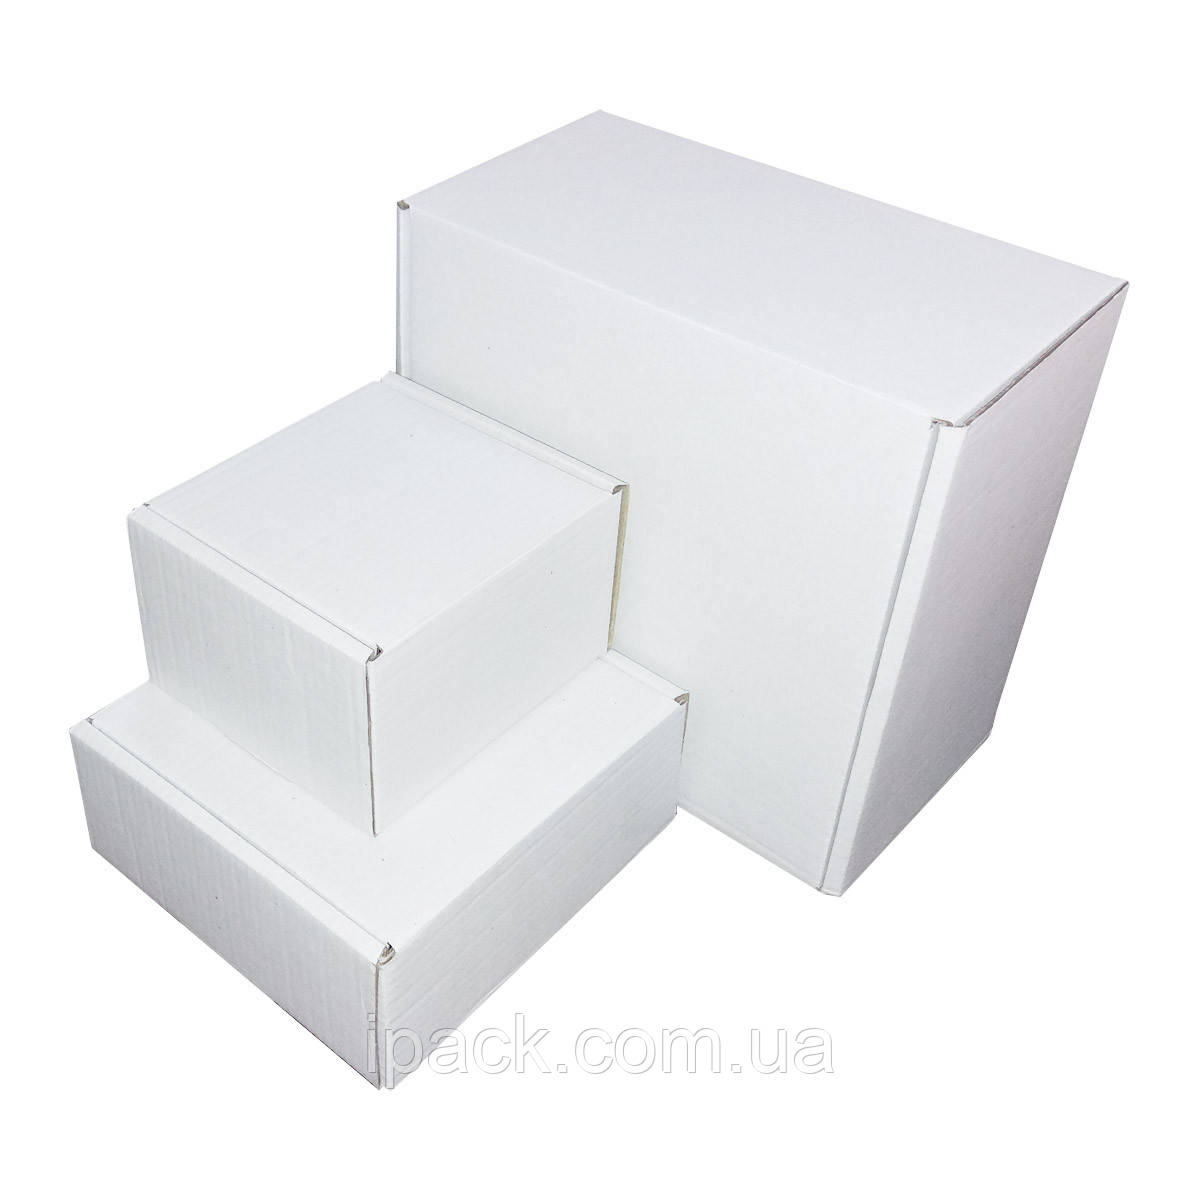 Коробка картонная самосборная, 200*200*50, мм, белая, микрогофрокартон